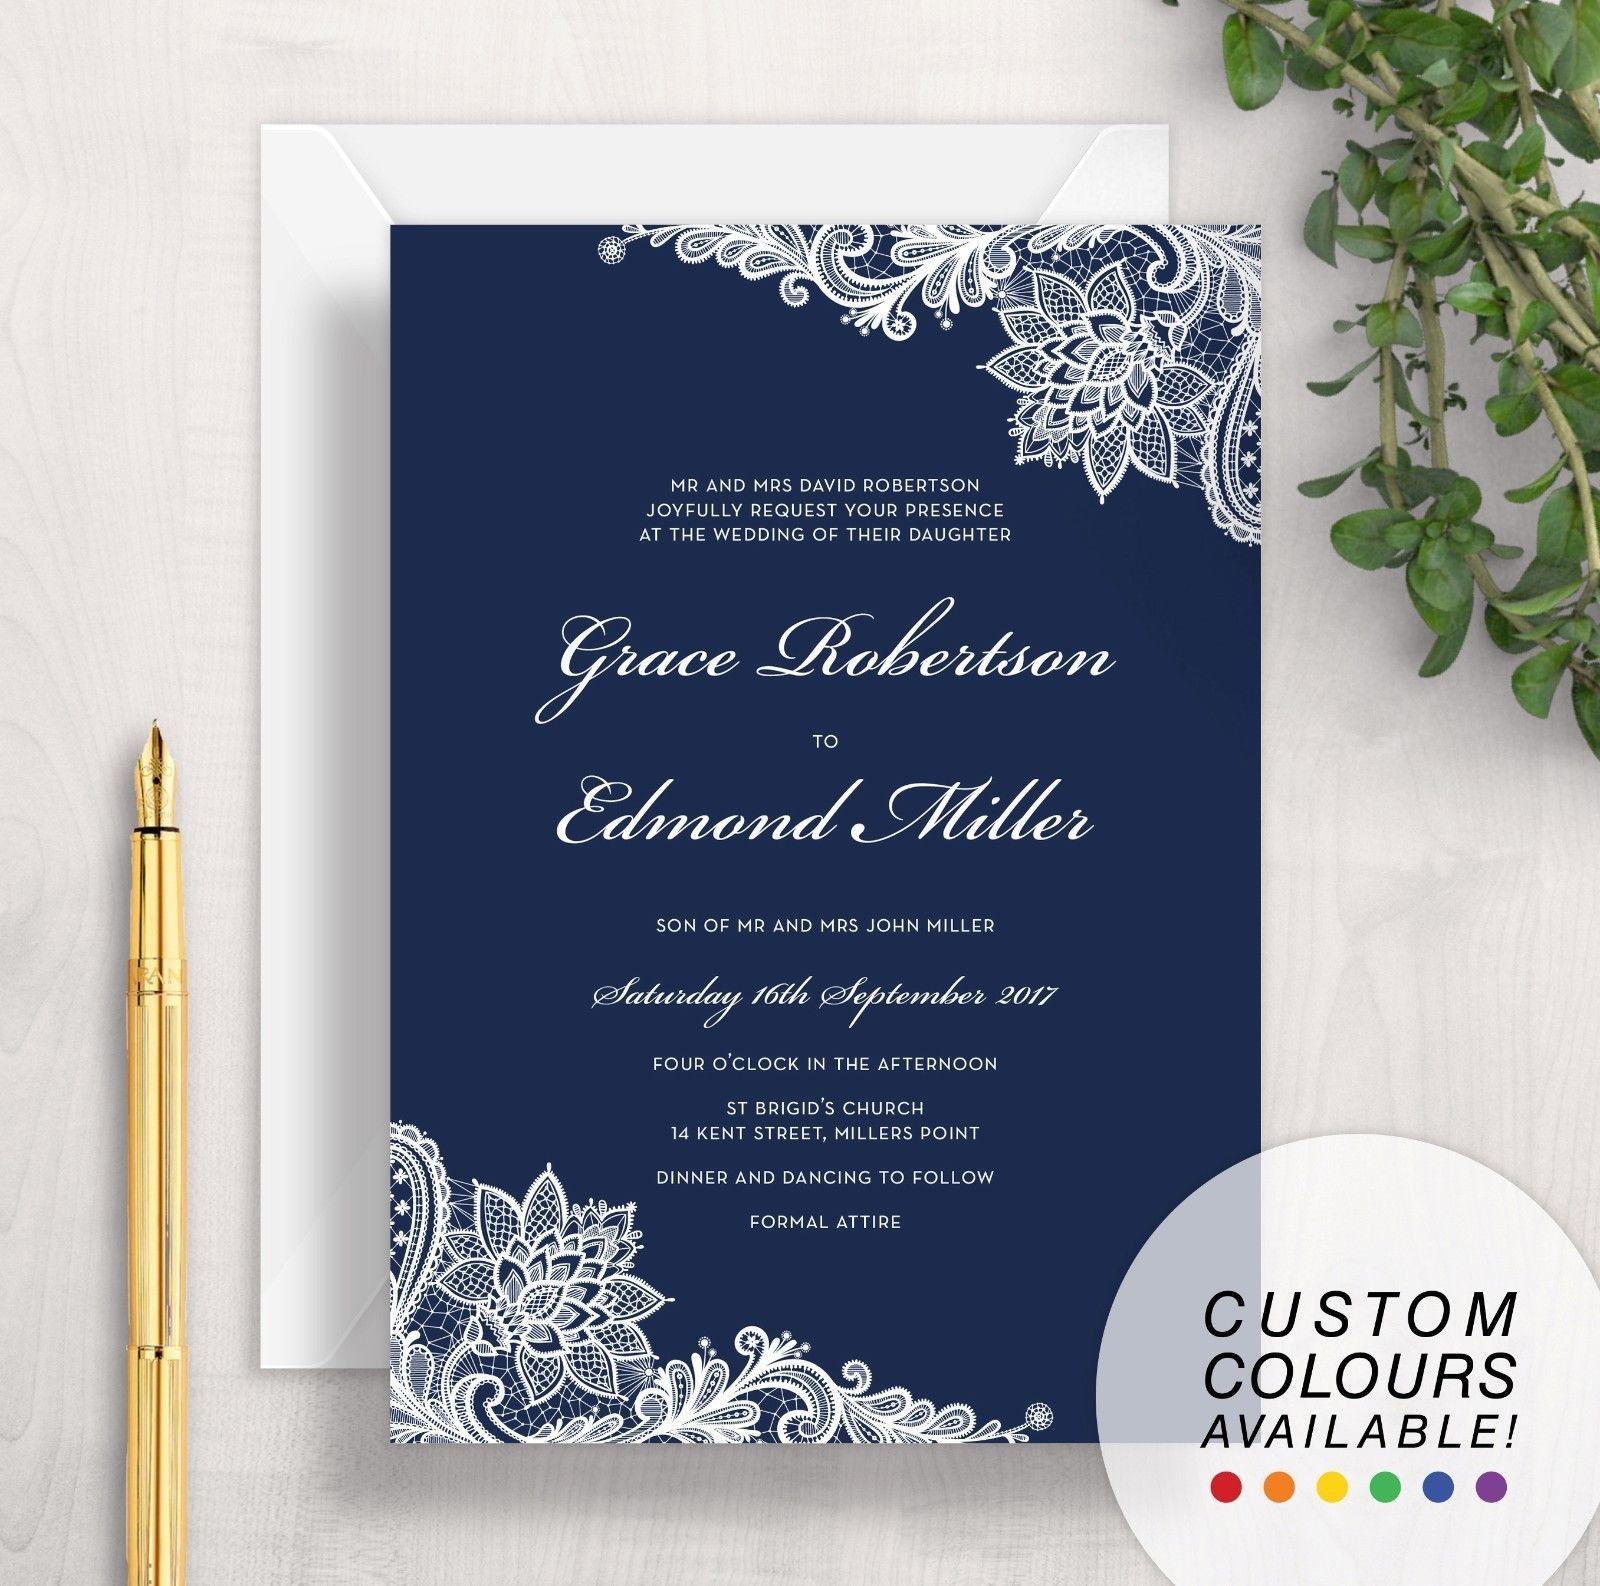 Sample Wedding Invitation Navy Blue White Lace Formal Elegant Vintage Floral Wedding Invitation Samples Navy Wedding Invitations Navy Blue Wedding Invitations